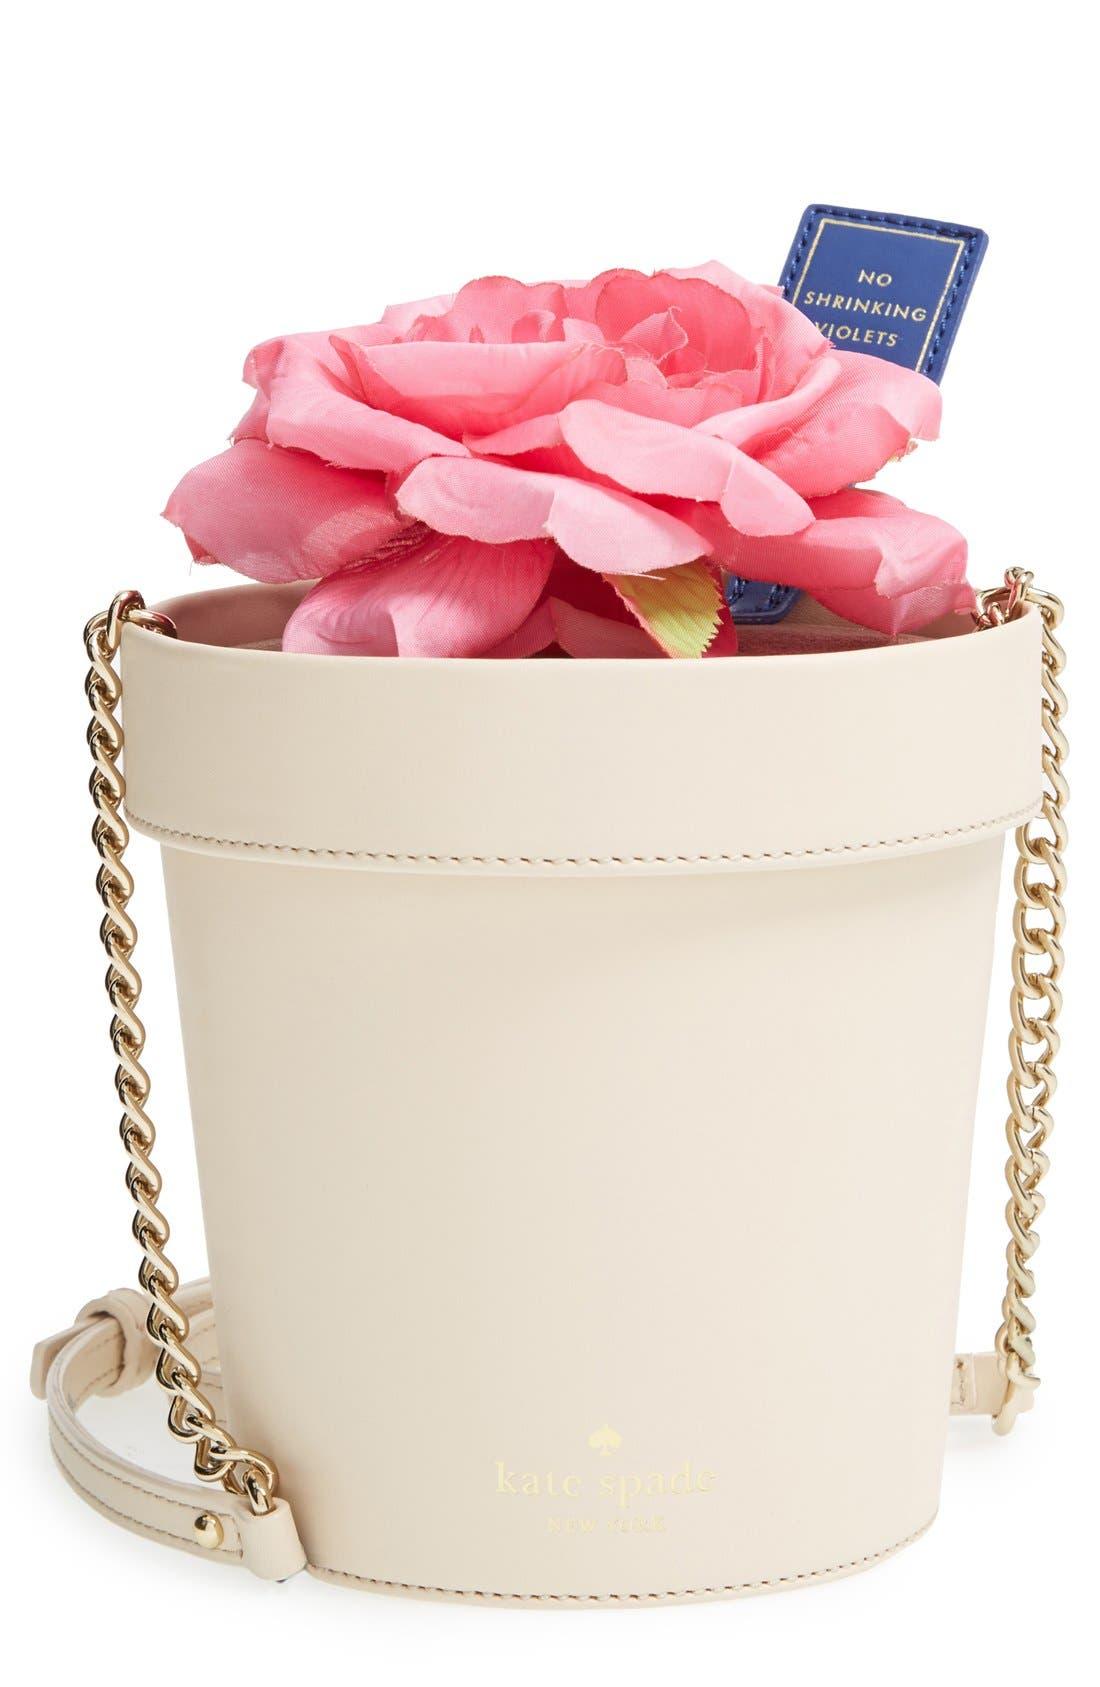 KATE SPADE NEW YORK 'spring forward - flowerpot' crossbody bag, Main, color, 100